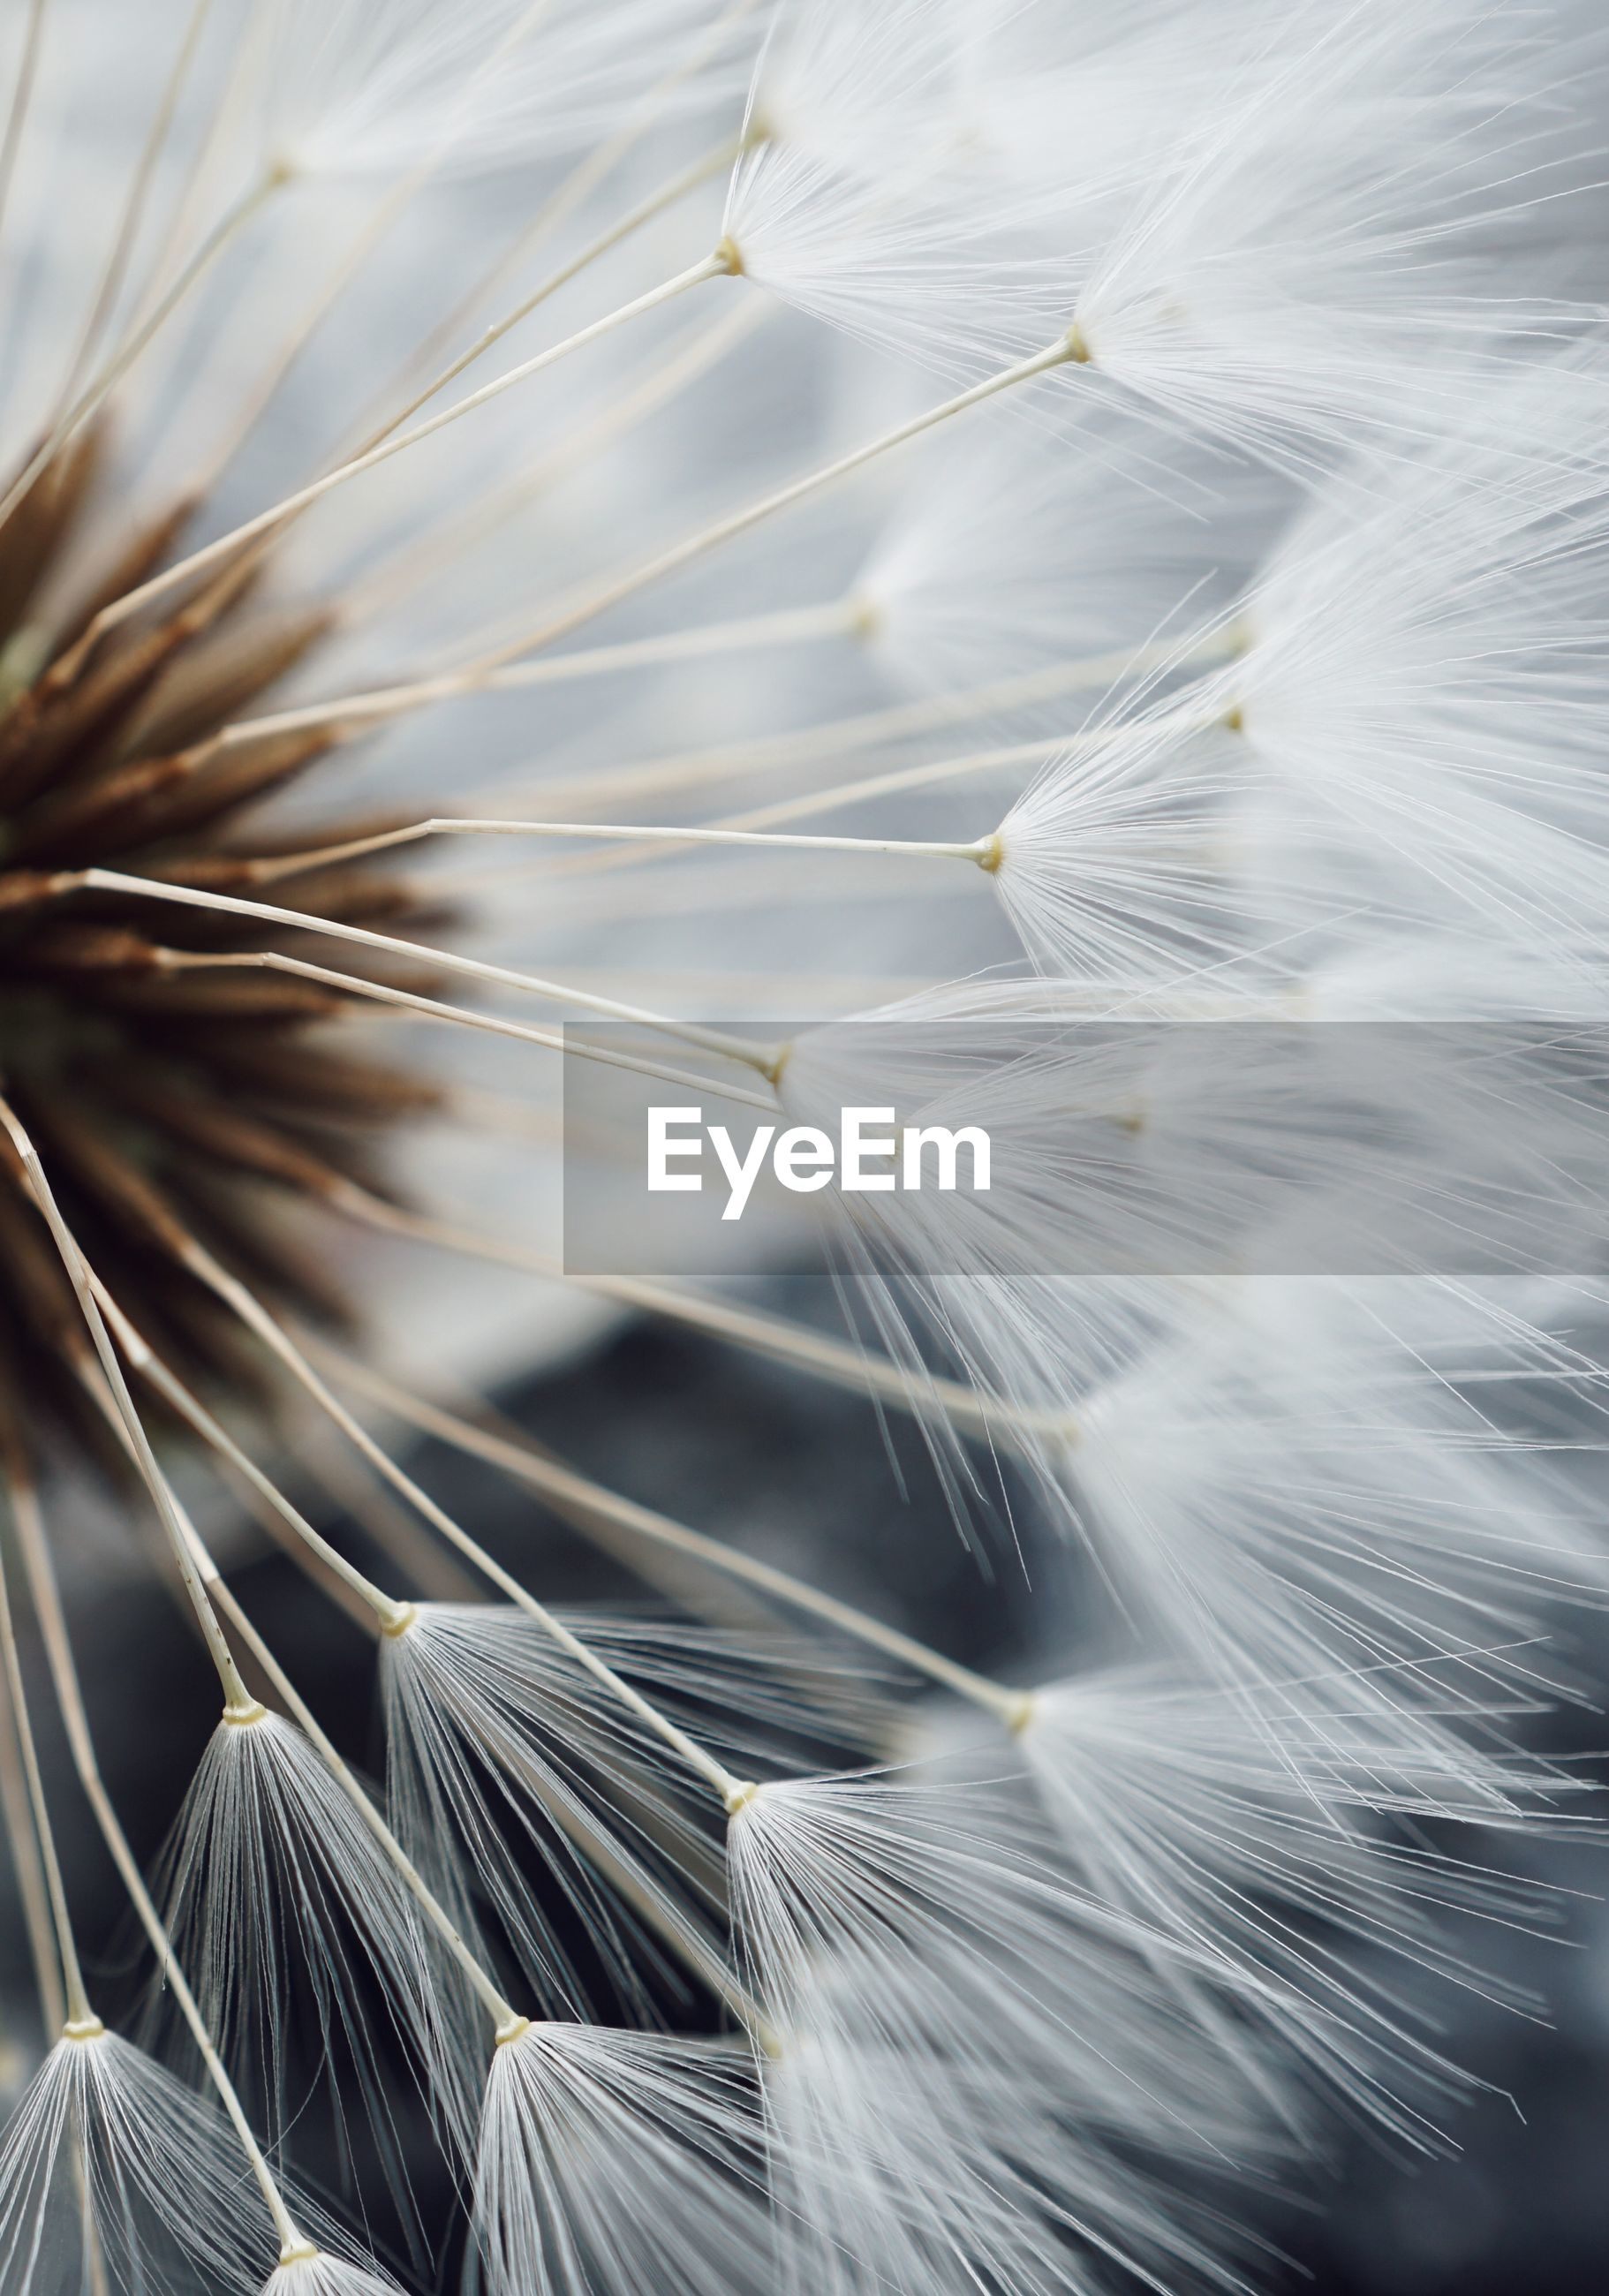 Extreme close-up of dandelion flower